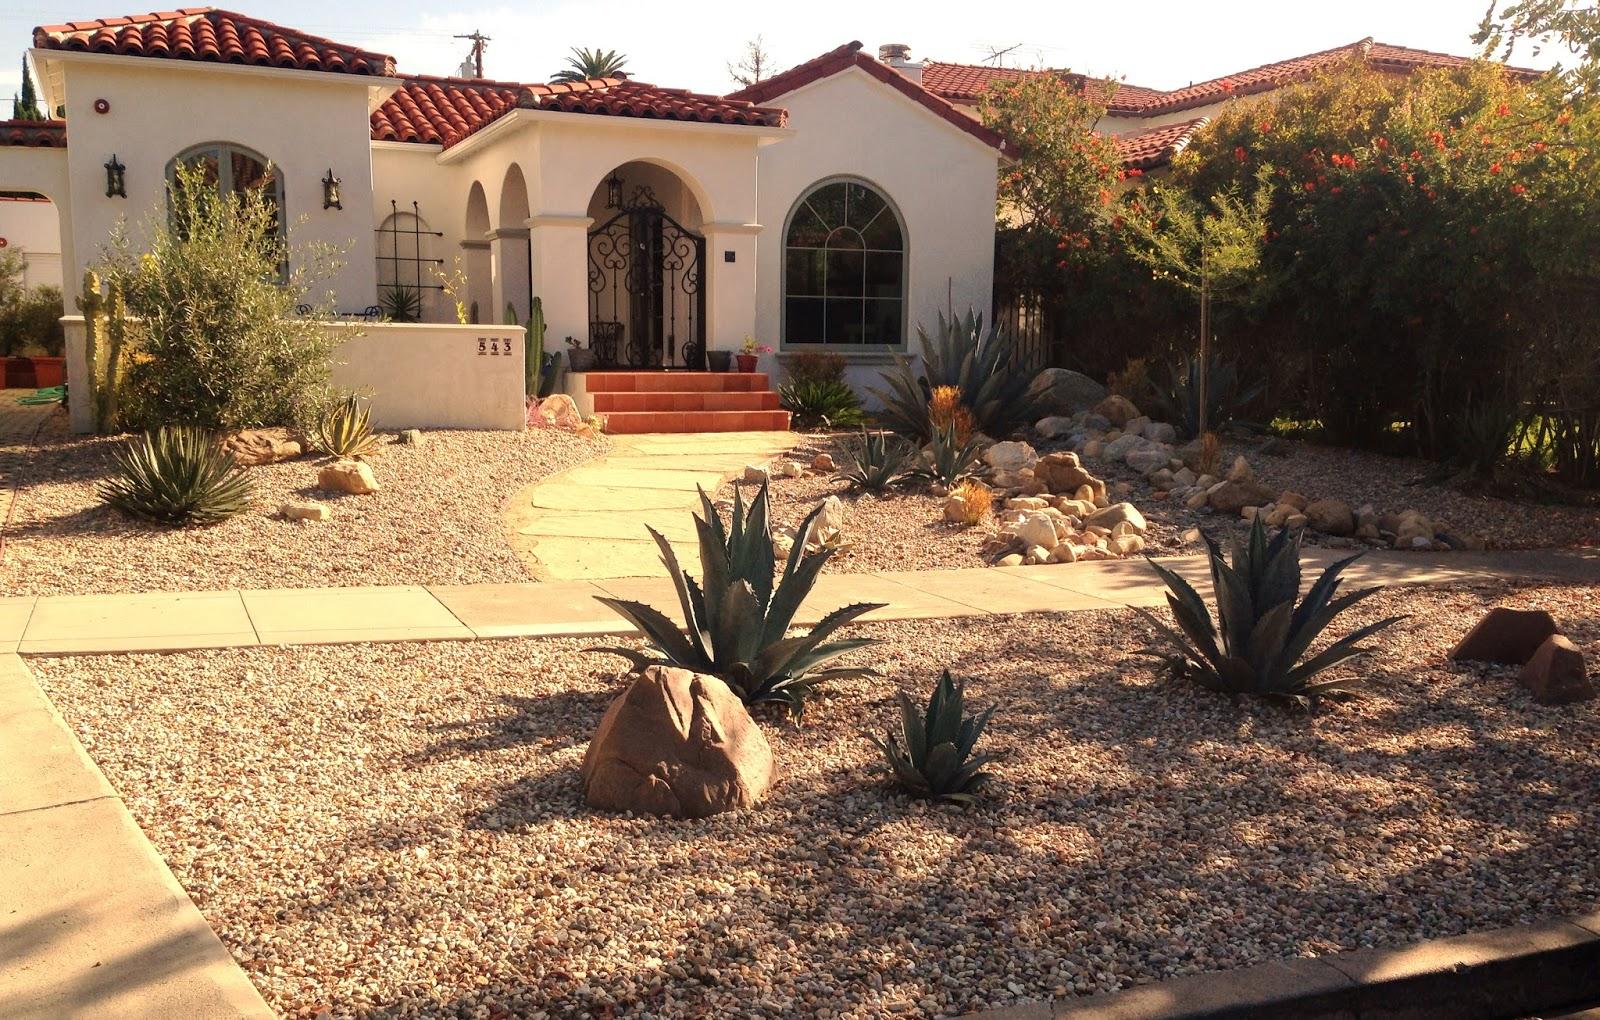 SVA Home and Garden